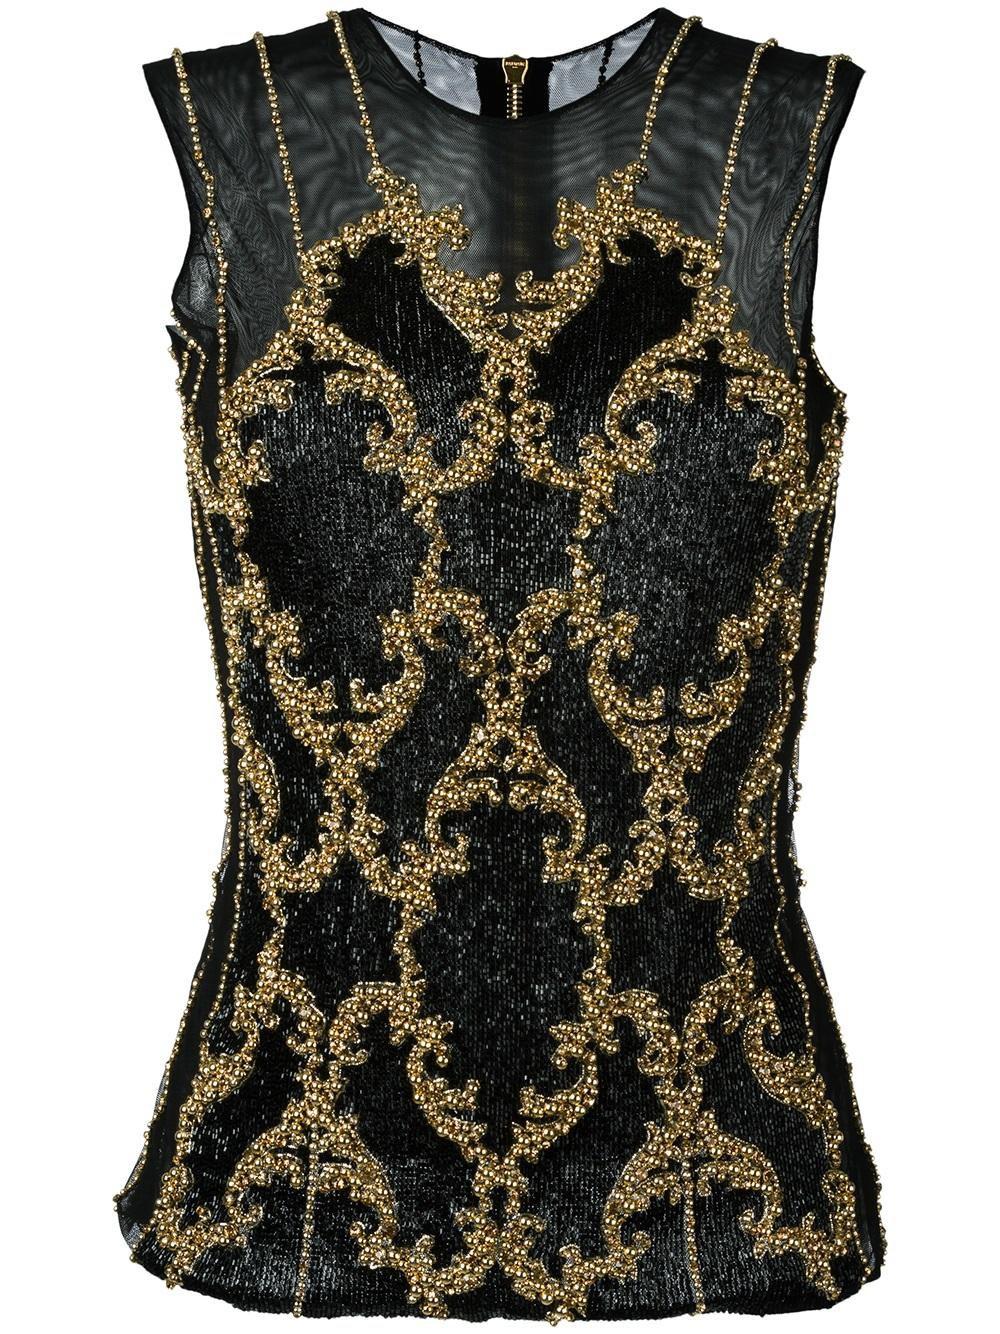 balmain shirt, Black sequin embroidered top from Balmain Women Blouses ,balmain pants on sale, balmain dress kim kardashian vmas free delivery